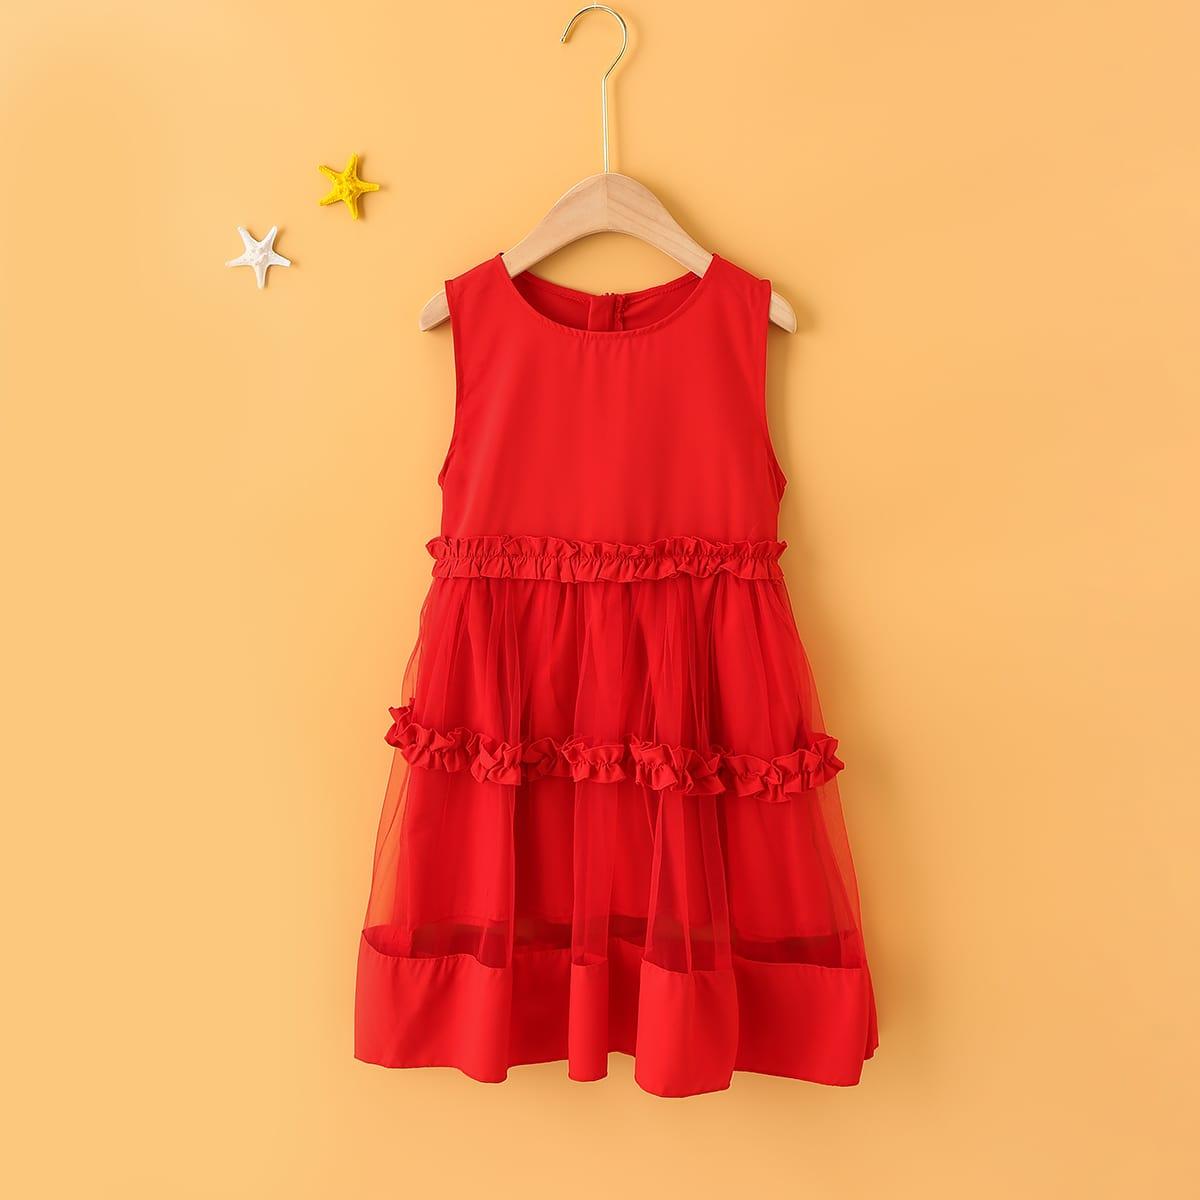 SHEIN / Toddler Girl Frill Mesh Panel A-line Dress